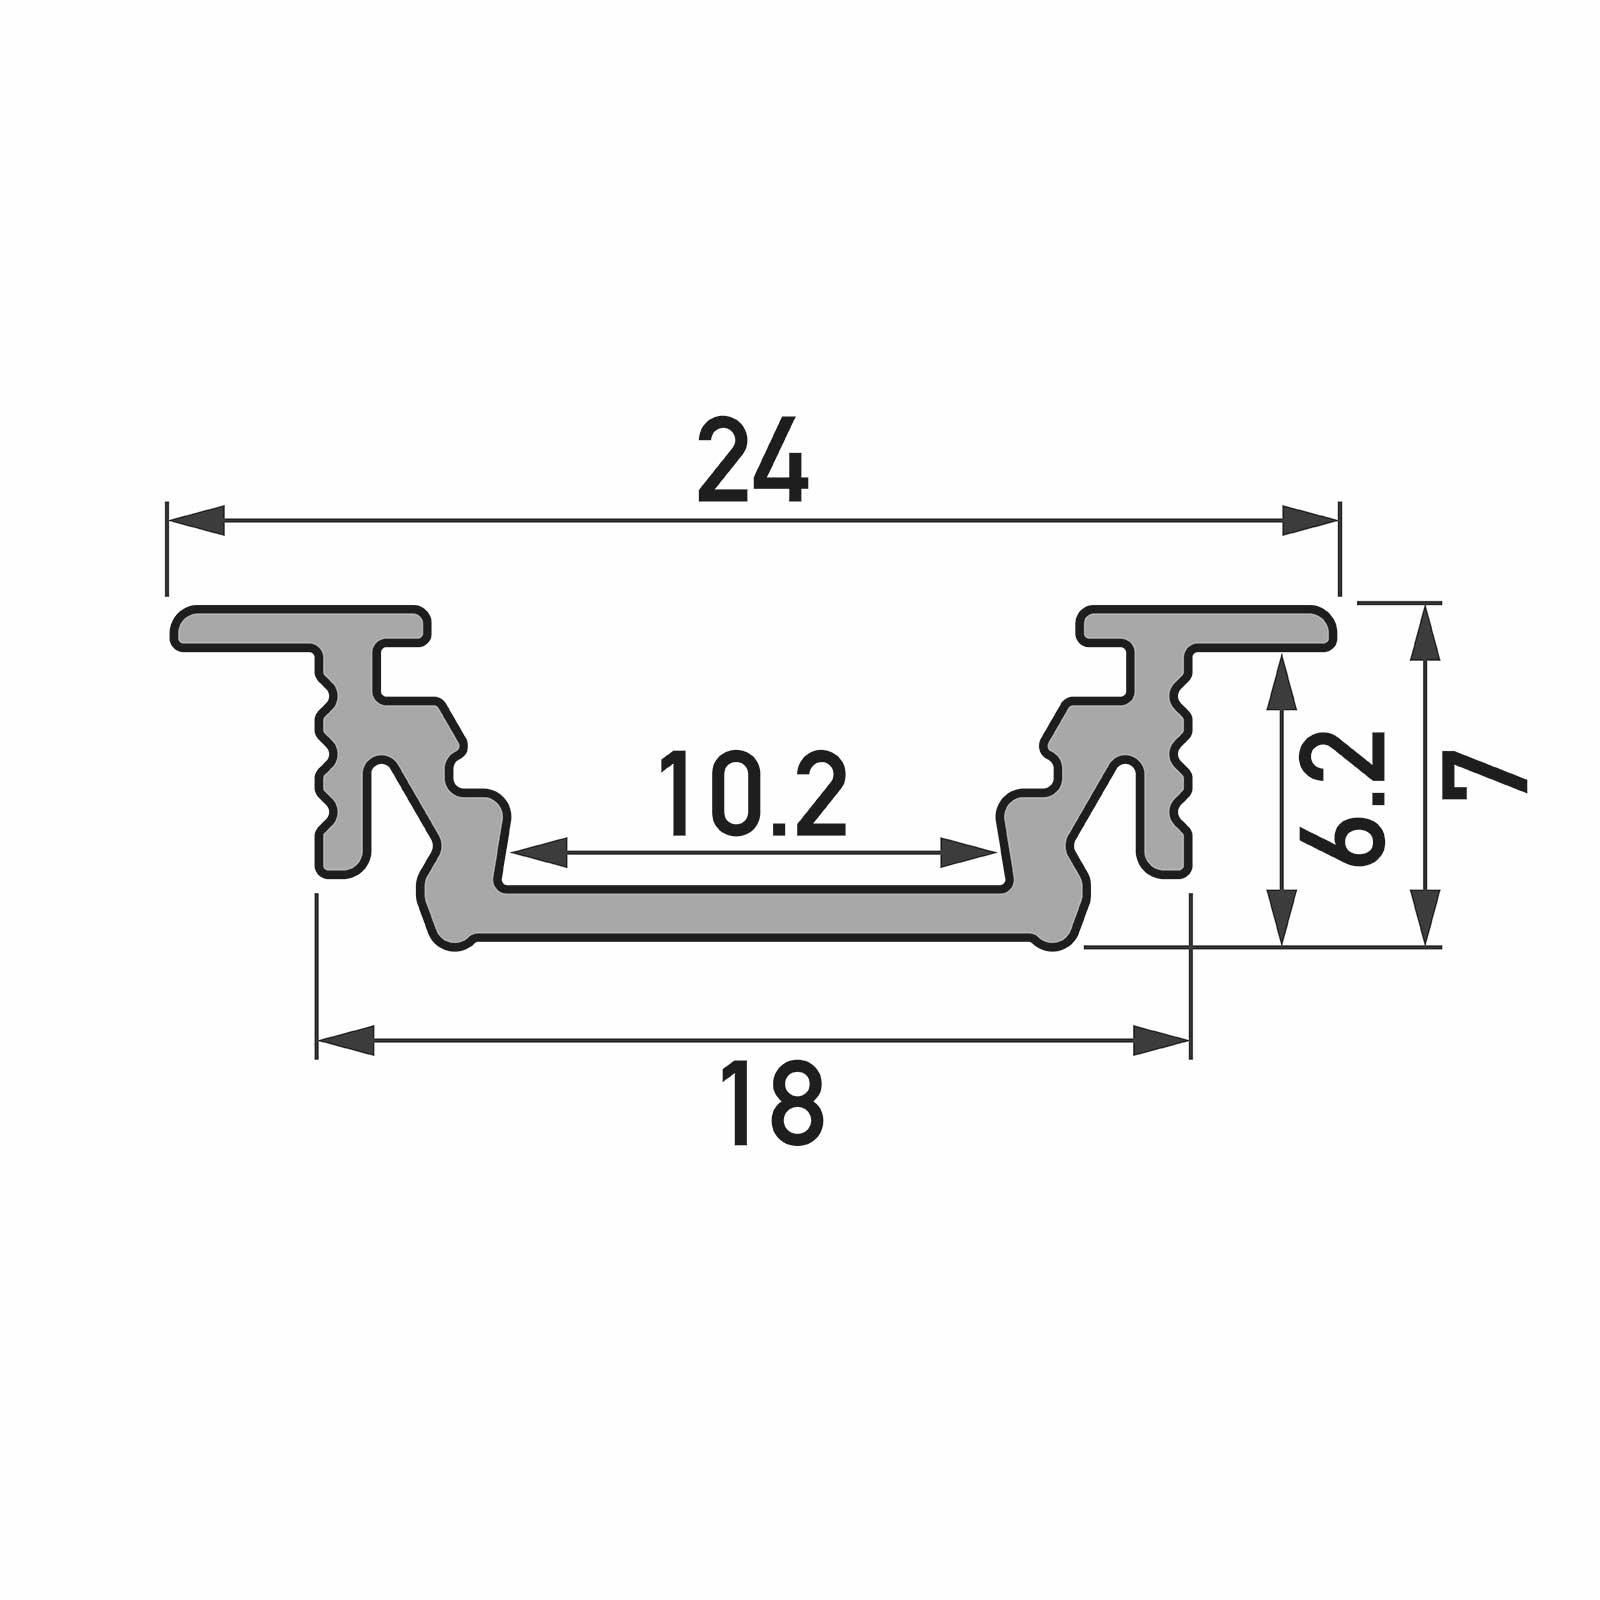 Bemassung 1-2 Meter LED Einbauprofil GROOVE (GR) - U-Profil